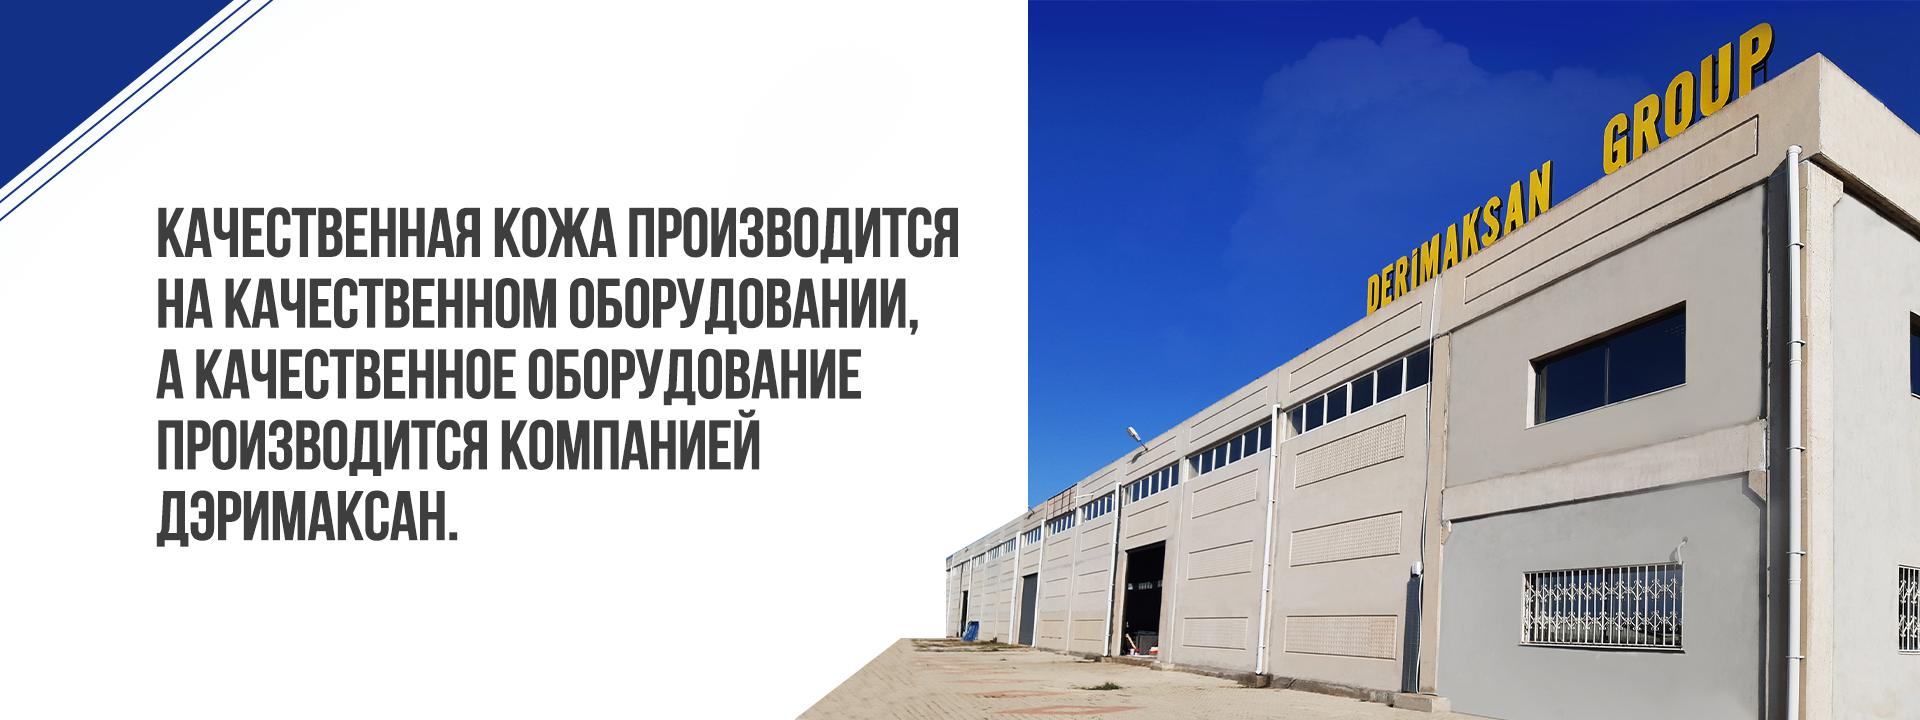 derimaksan-rus-ana-banner-2